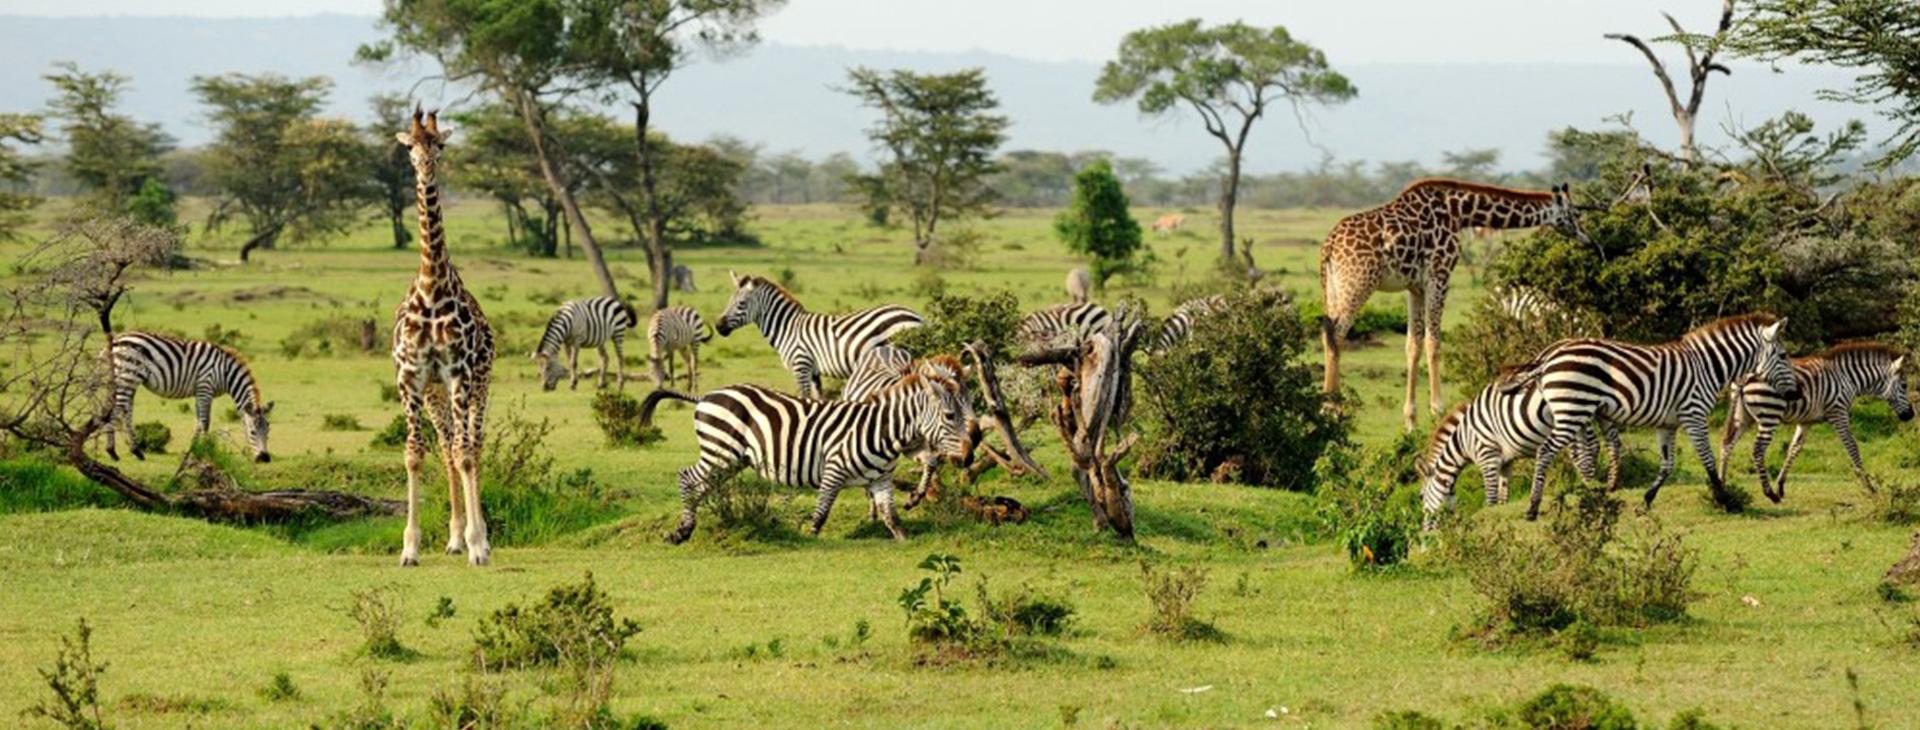 Tanzania and Kenya Halal Safari